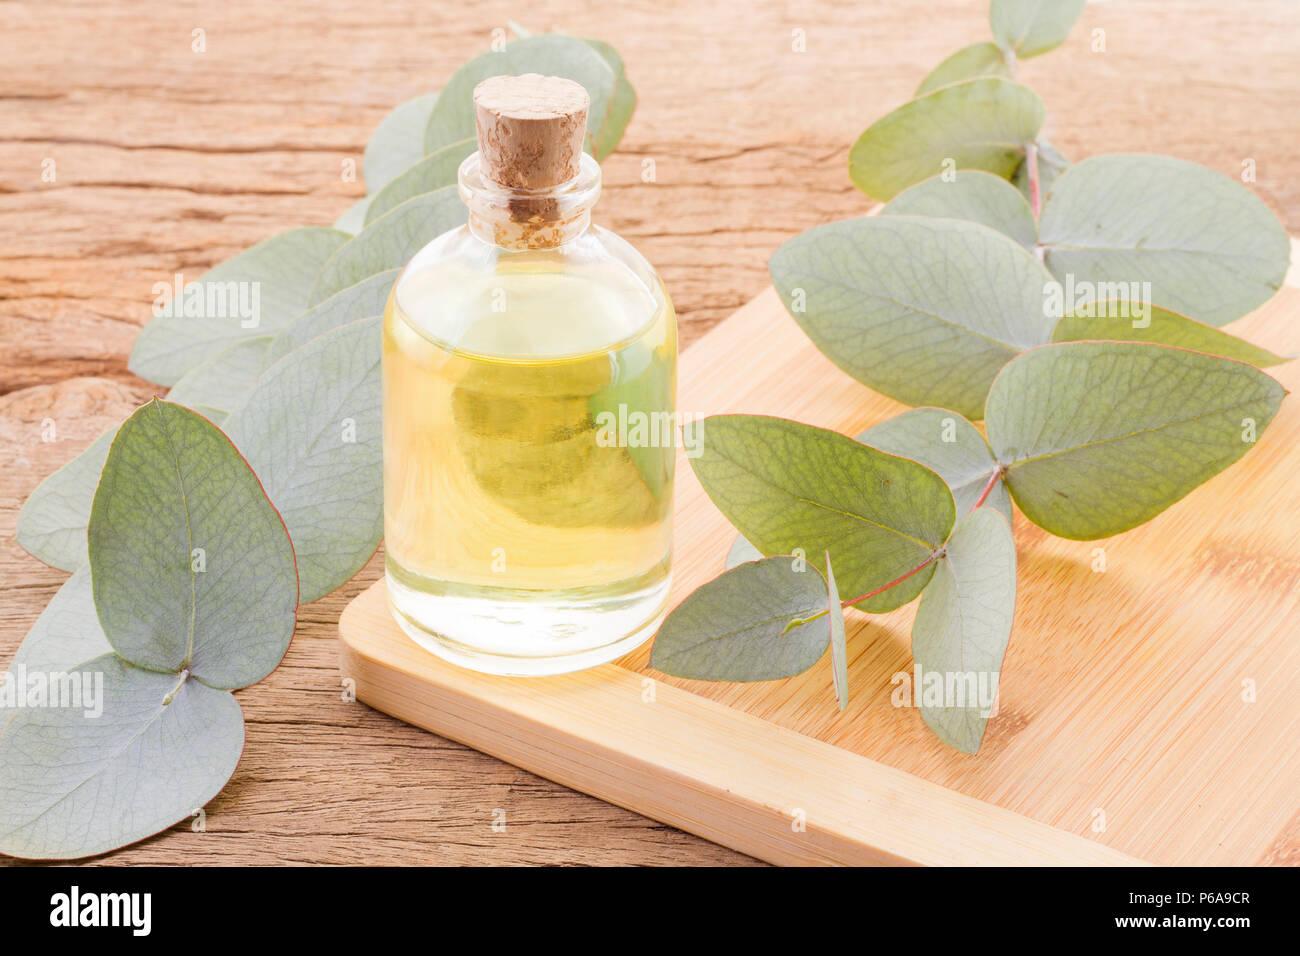 oil and eucalyptus leaves on the wooden table - Eucalyptus deglupta - Stock Image